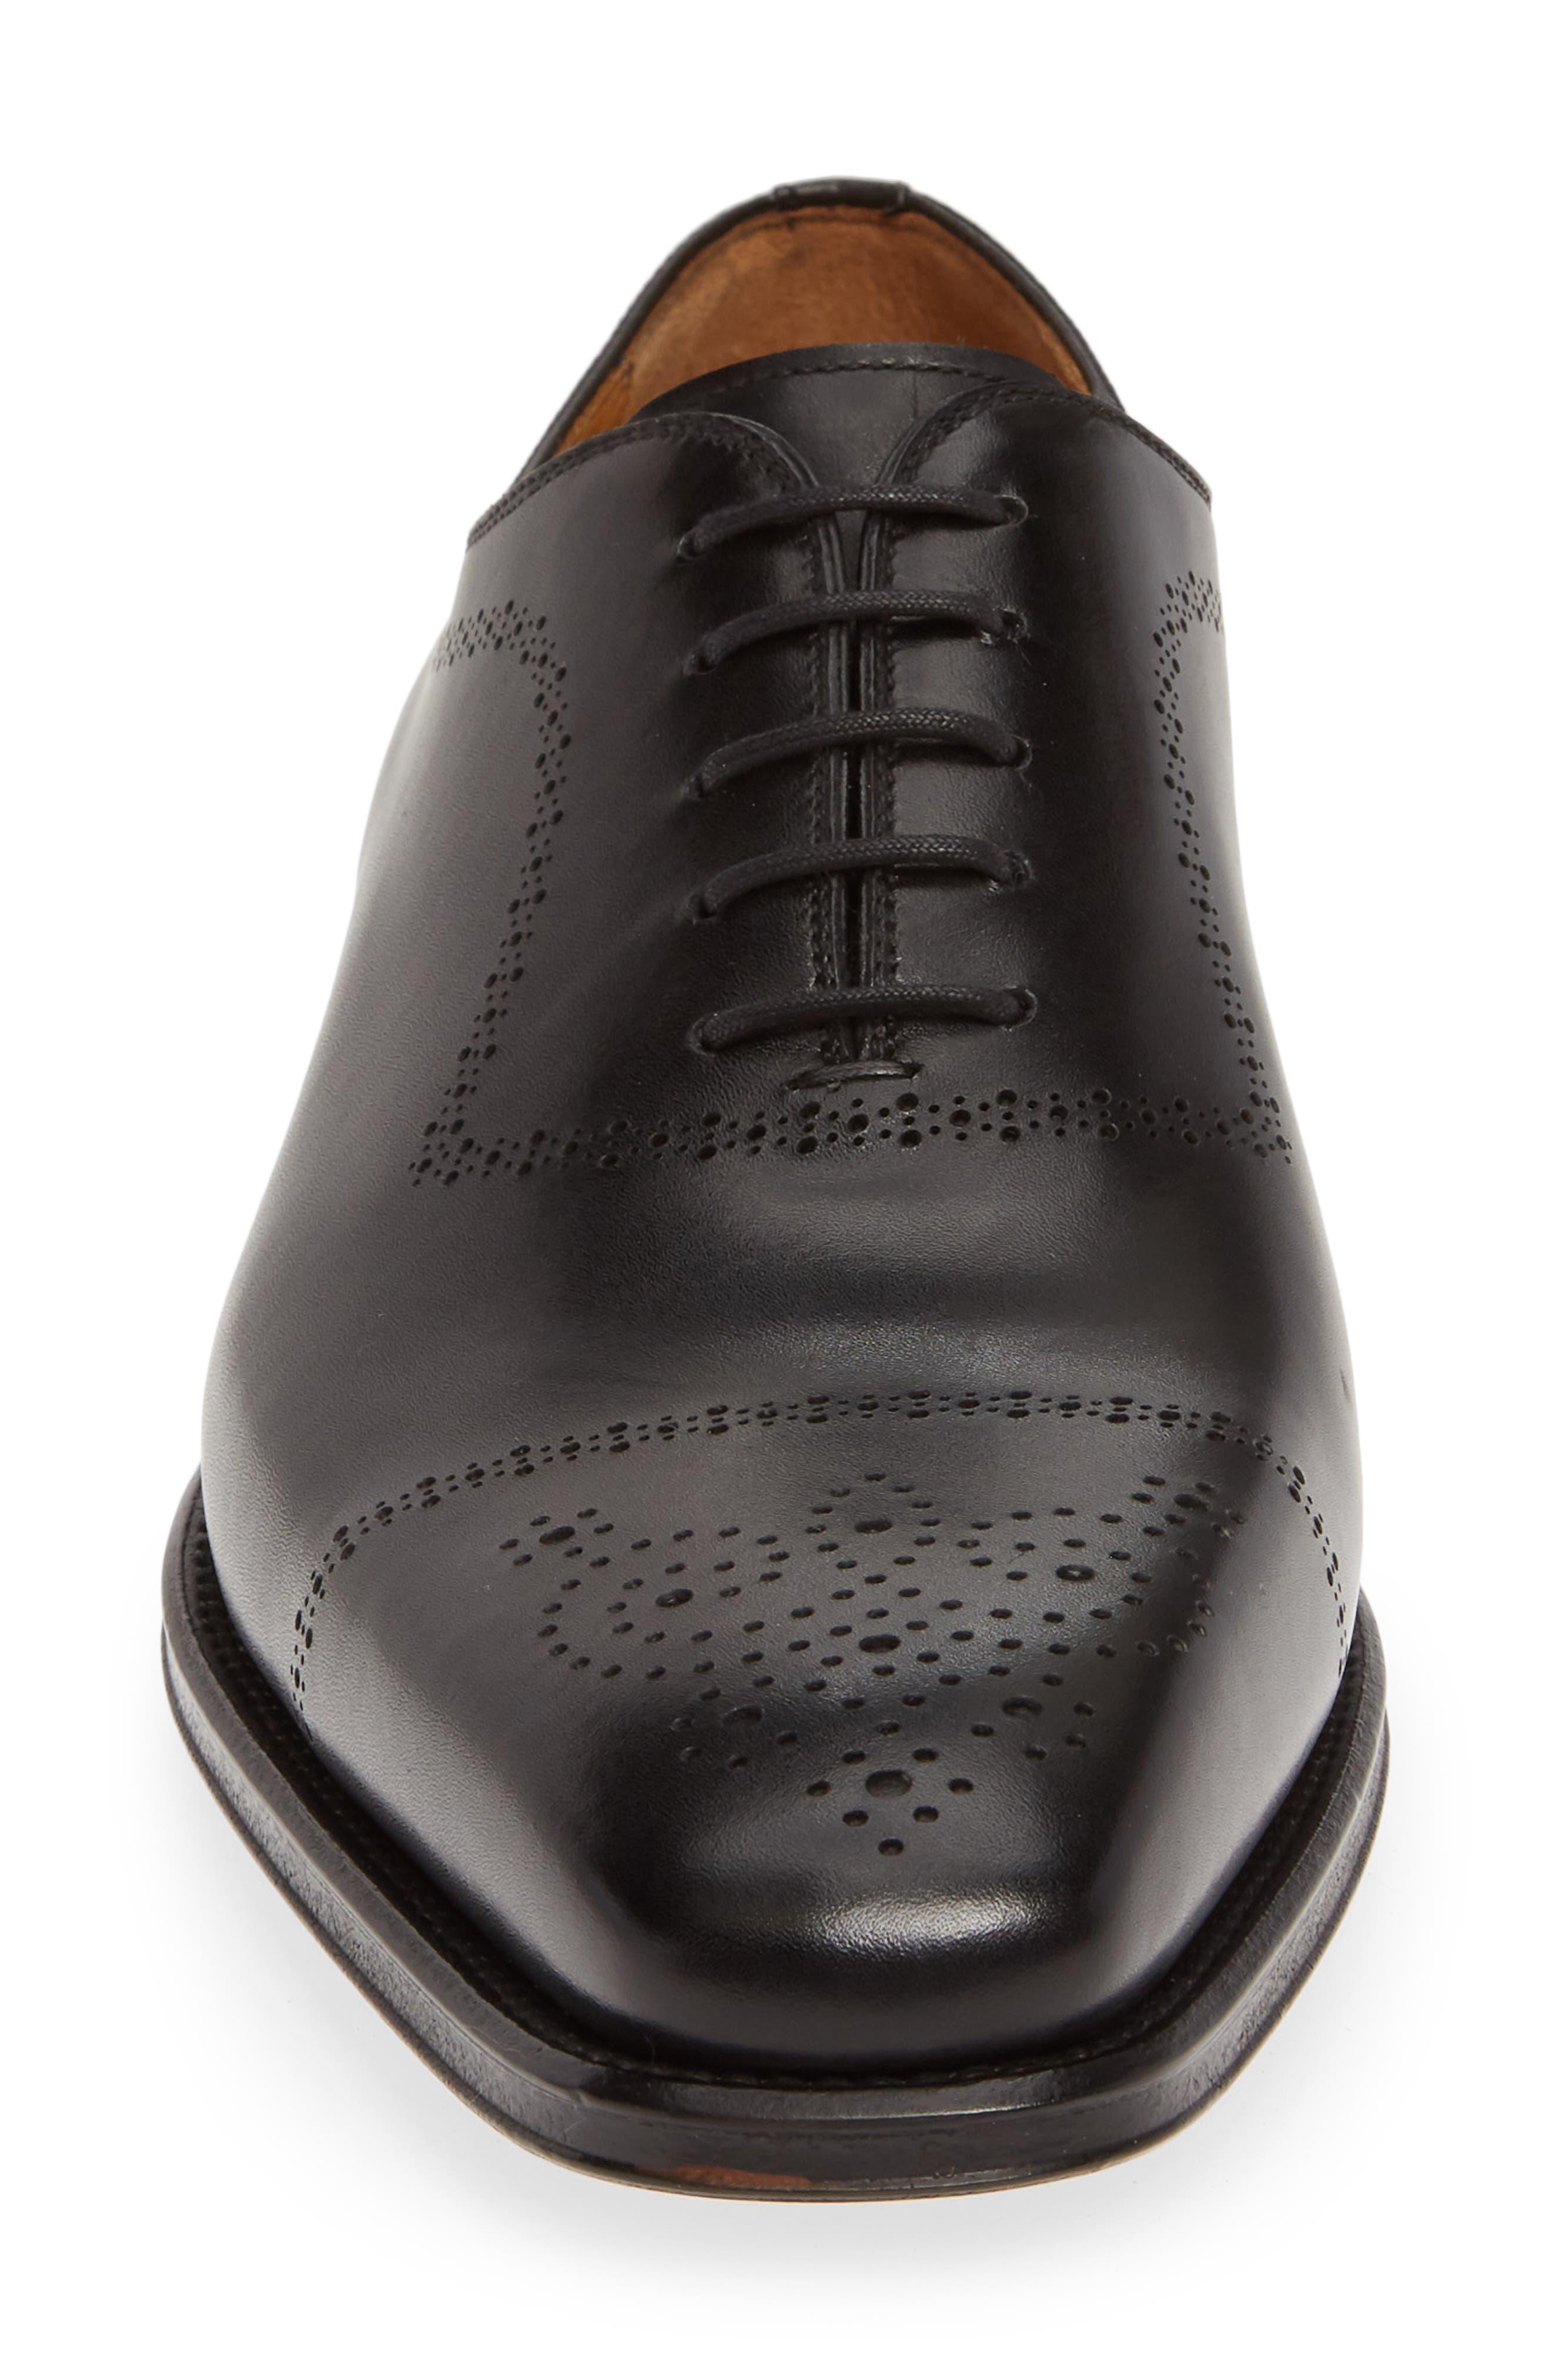 MAGNANNI, Leyton Medallion Toe Oxford, Alternate thumbnail 4, color, BLACK LEATHER